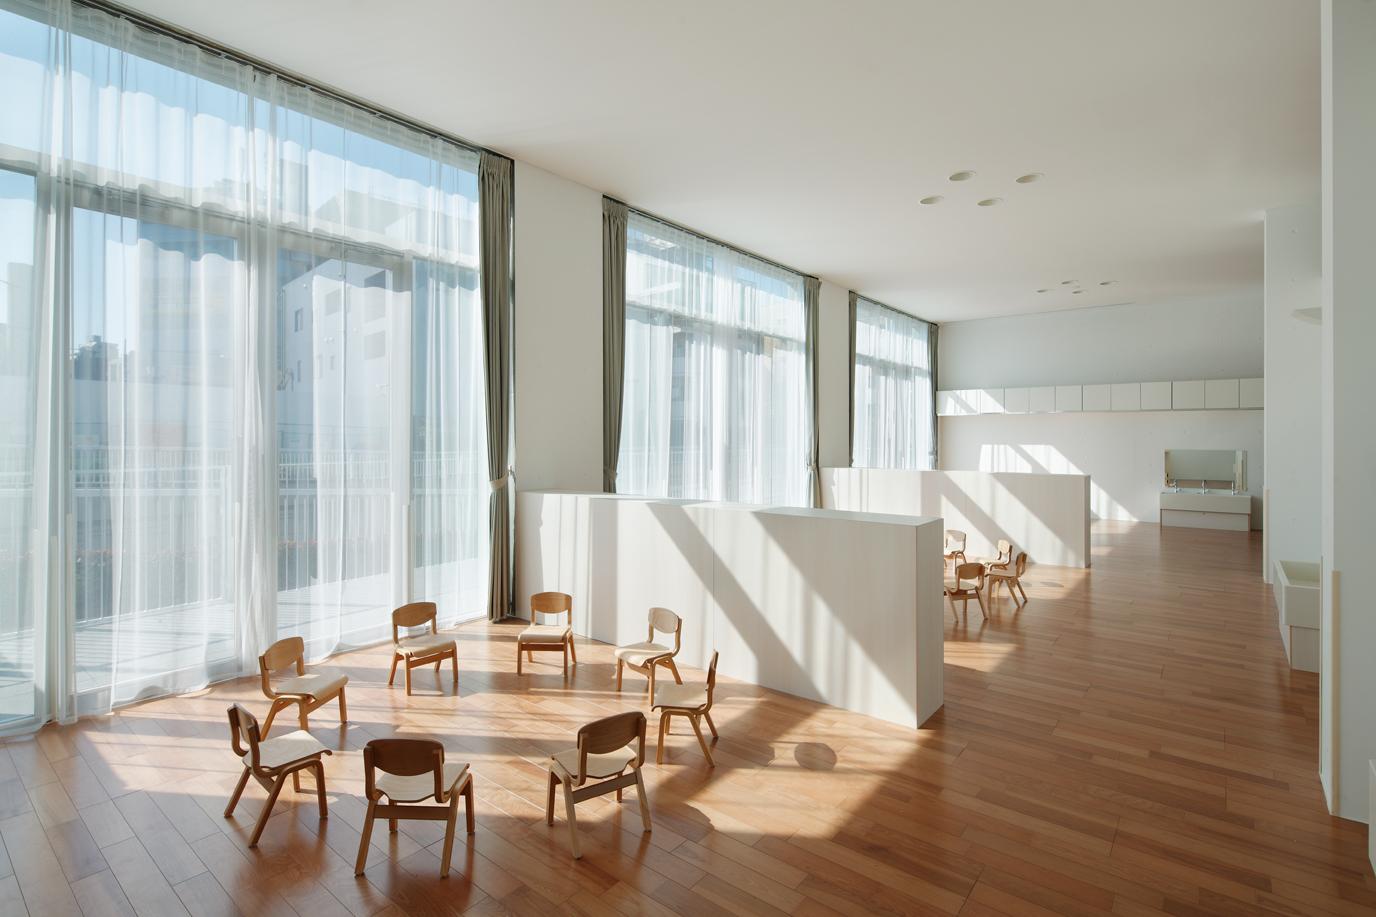 Interior Design Main Day Nursery In Japan By Takeshi Yamagata Architects